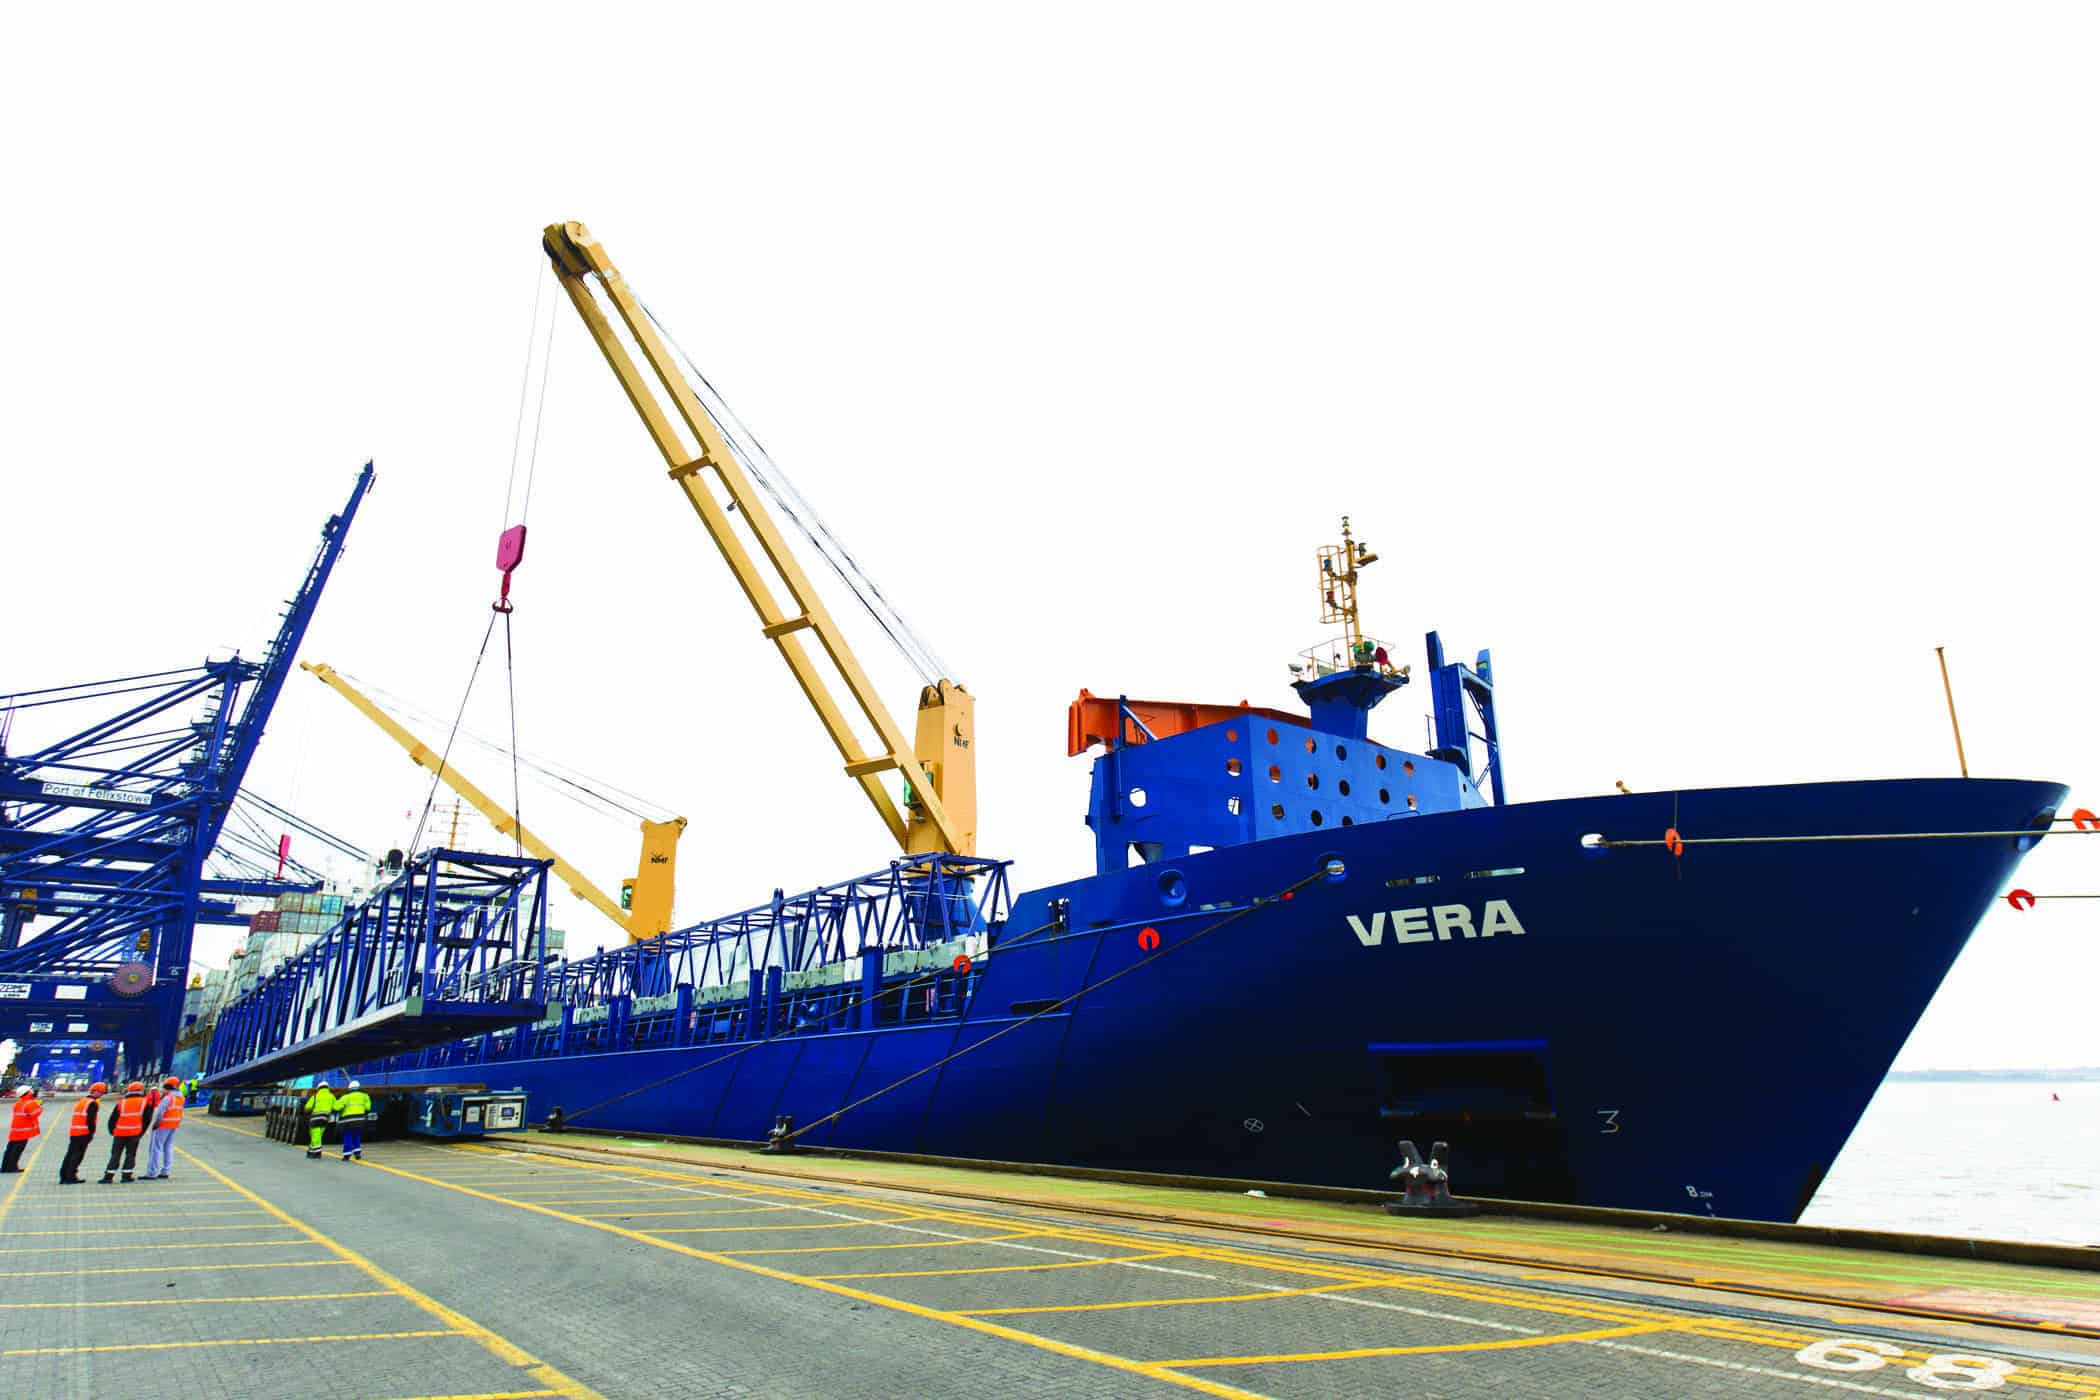 Felixstowe to double rail capacity